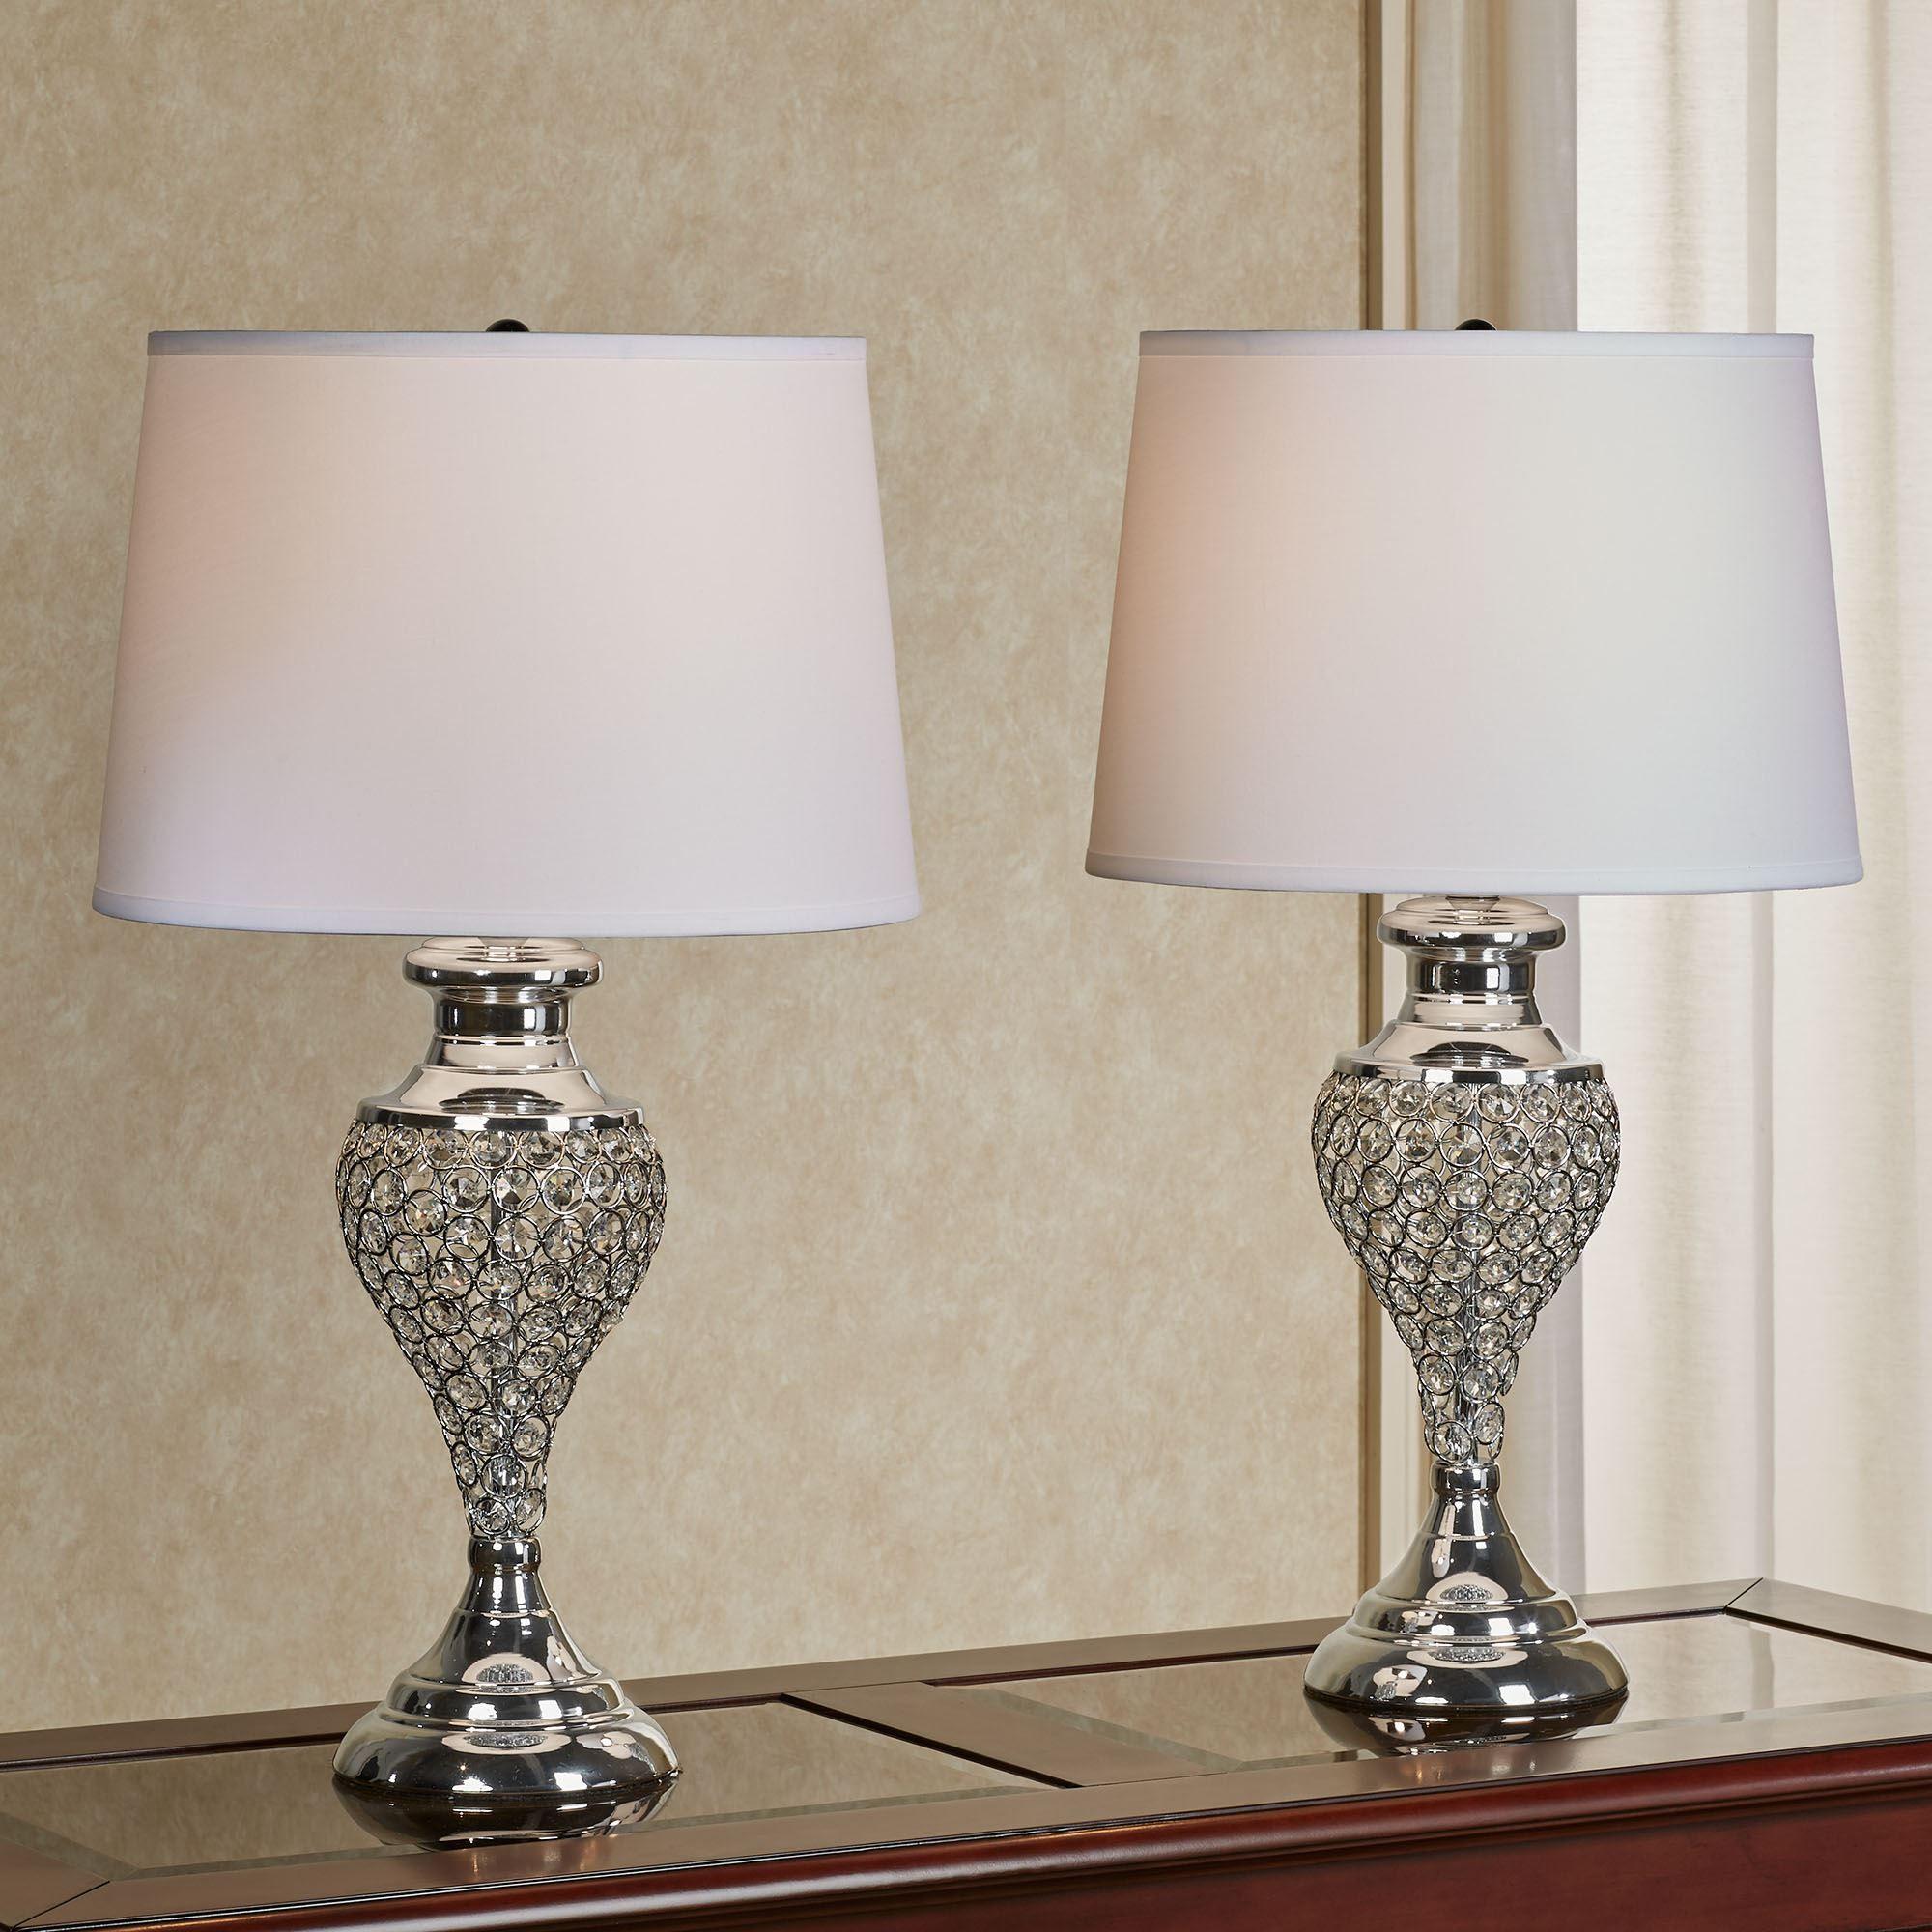 Katherine Crystal Bead Polished Chrome Metal Table Lamp Pair